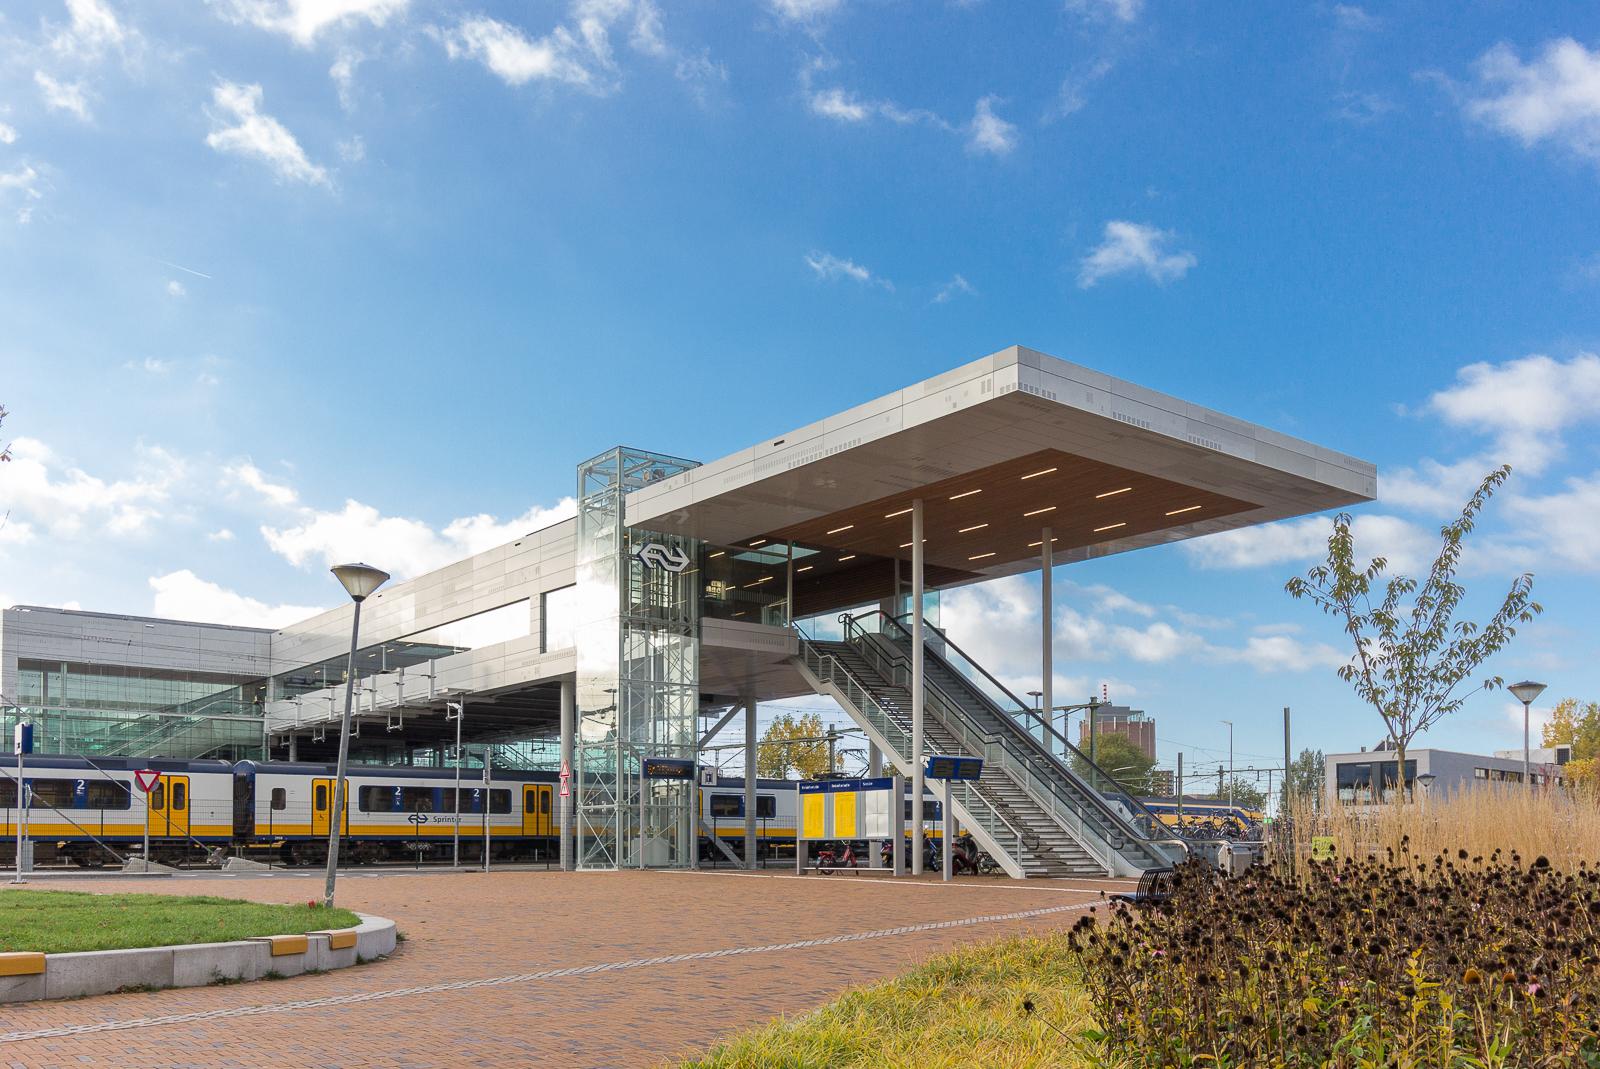 station_alkmaar_5